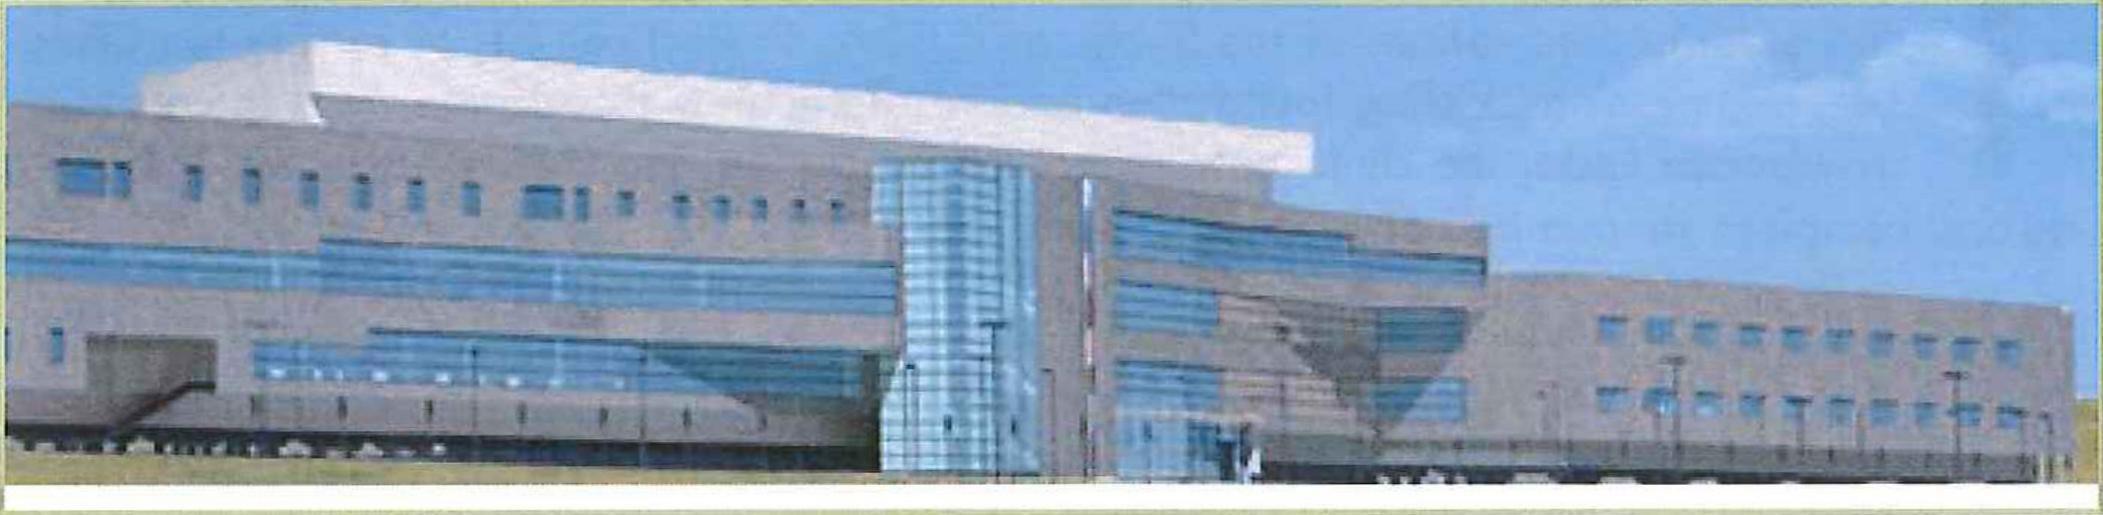 Paug Vik Development Corporation Newsletter Paug Vik